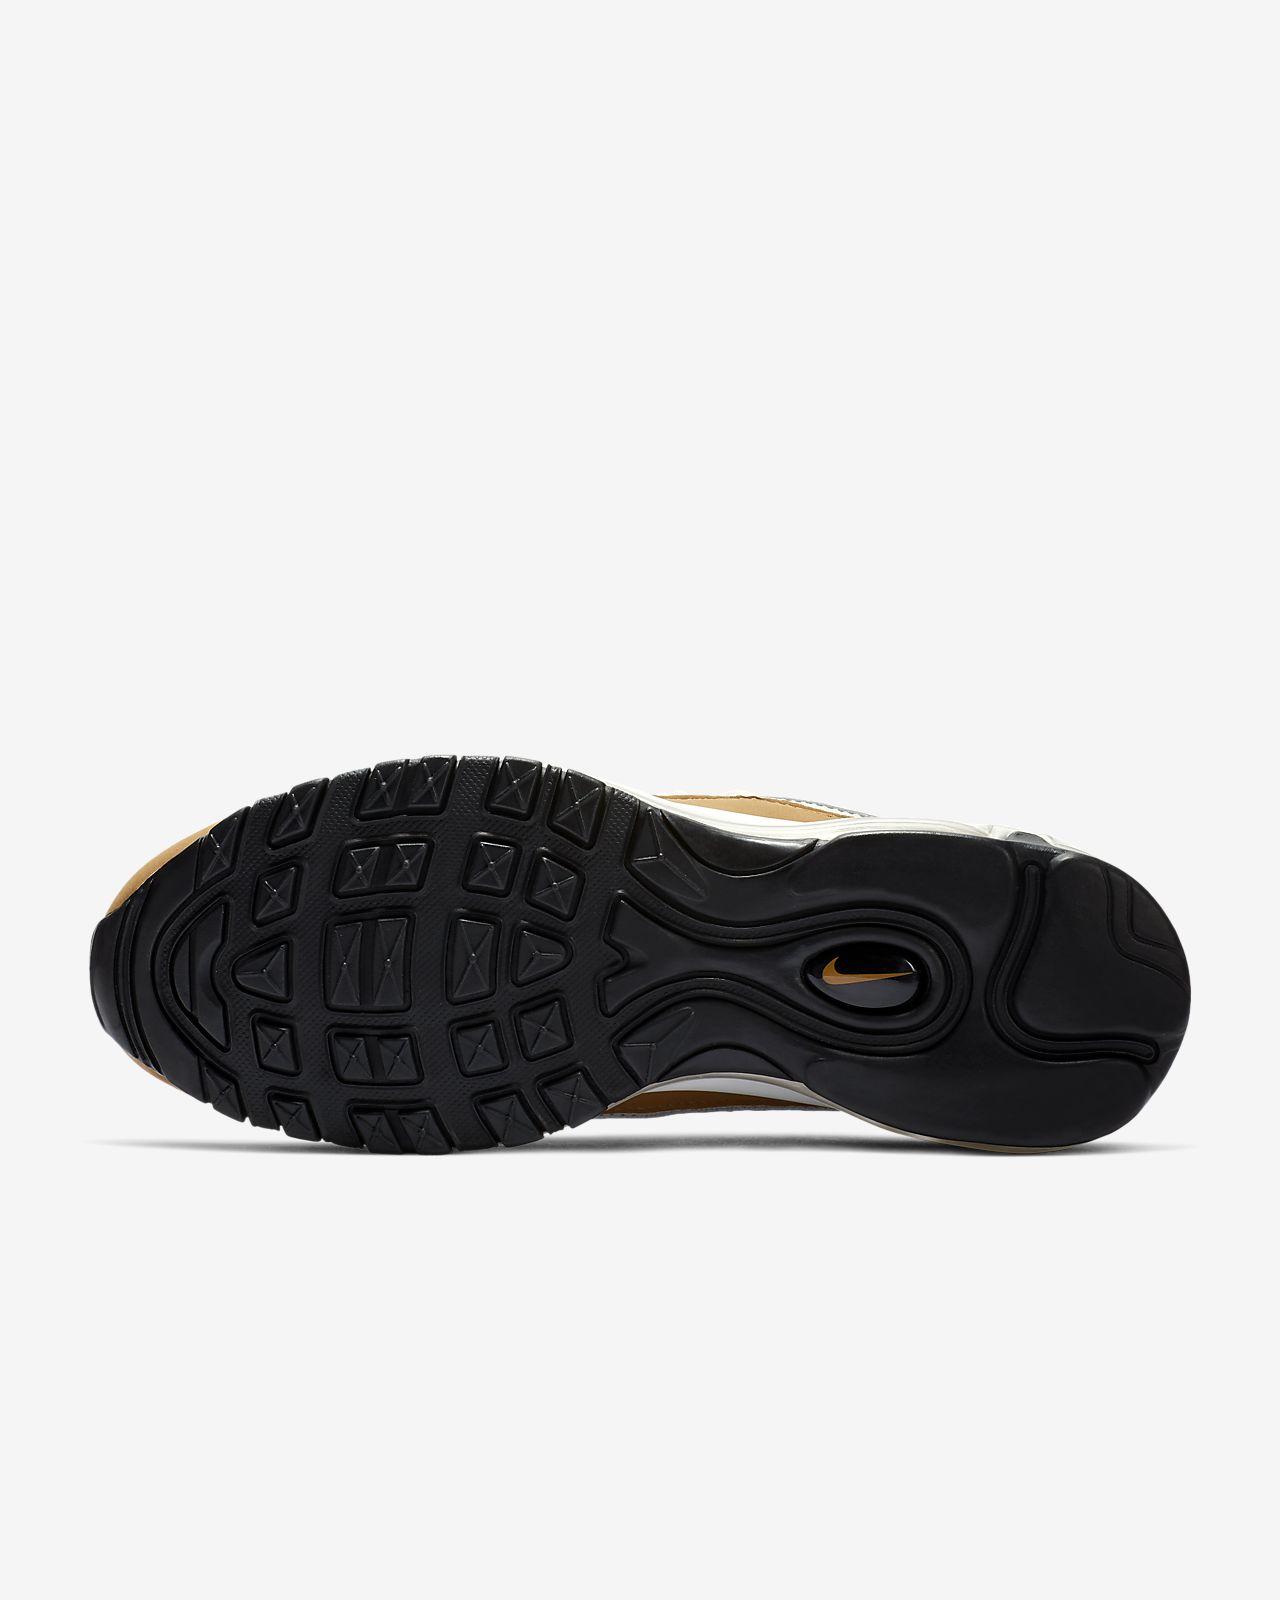 d21629f92290 Nike Air Max 98 Beige Women s Shoe. Nike.com DK